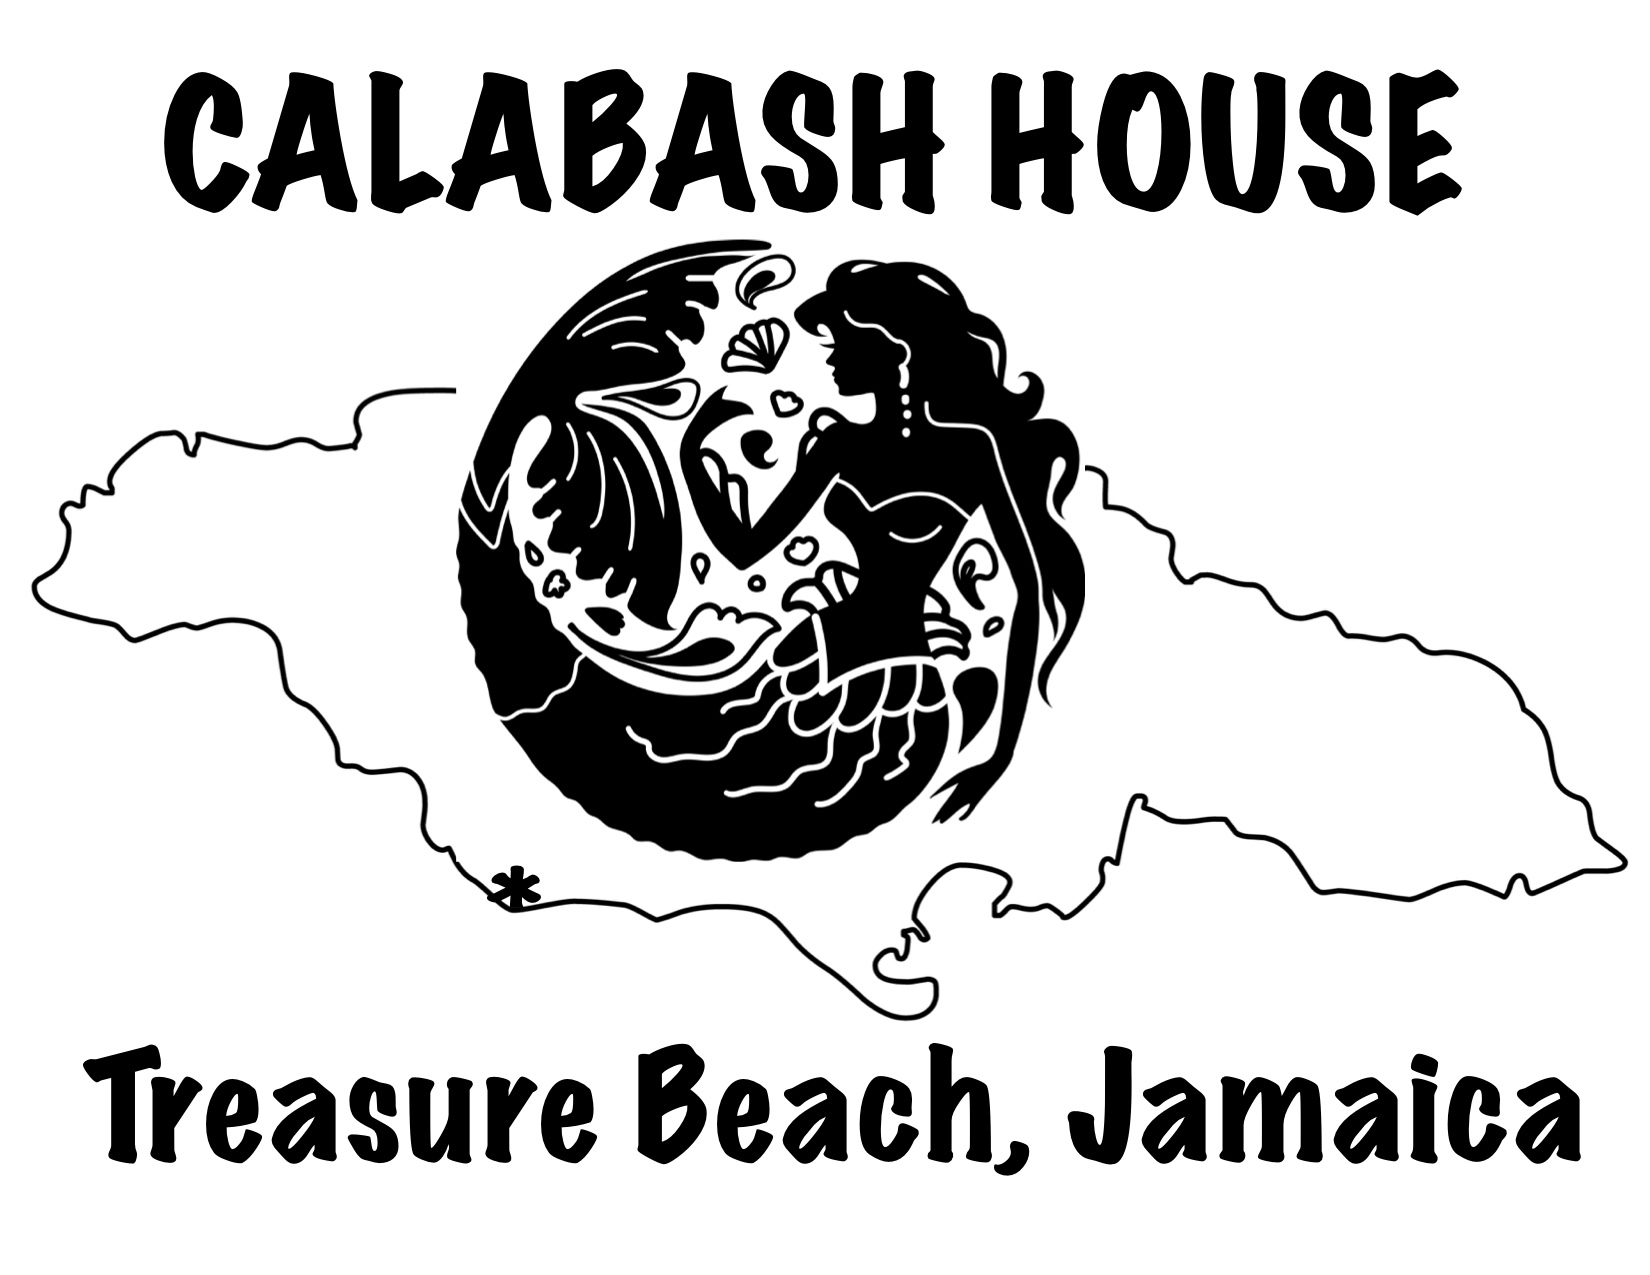 Calabash house logo